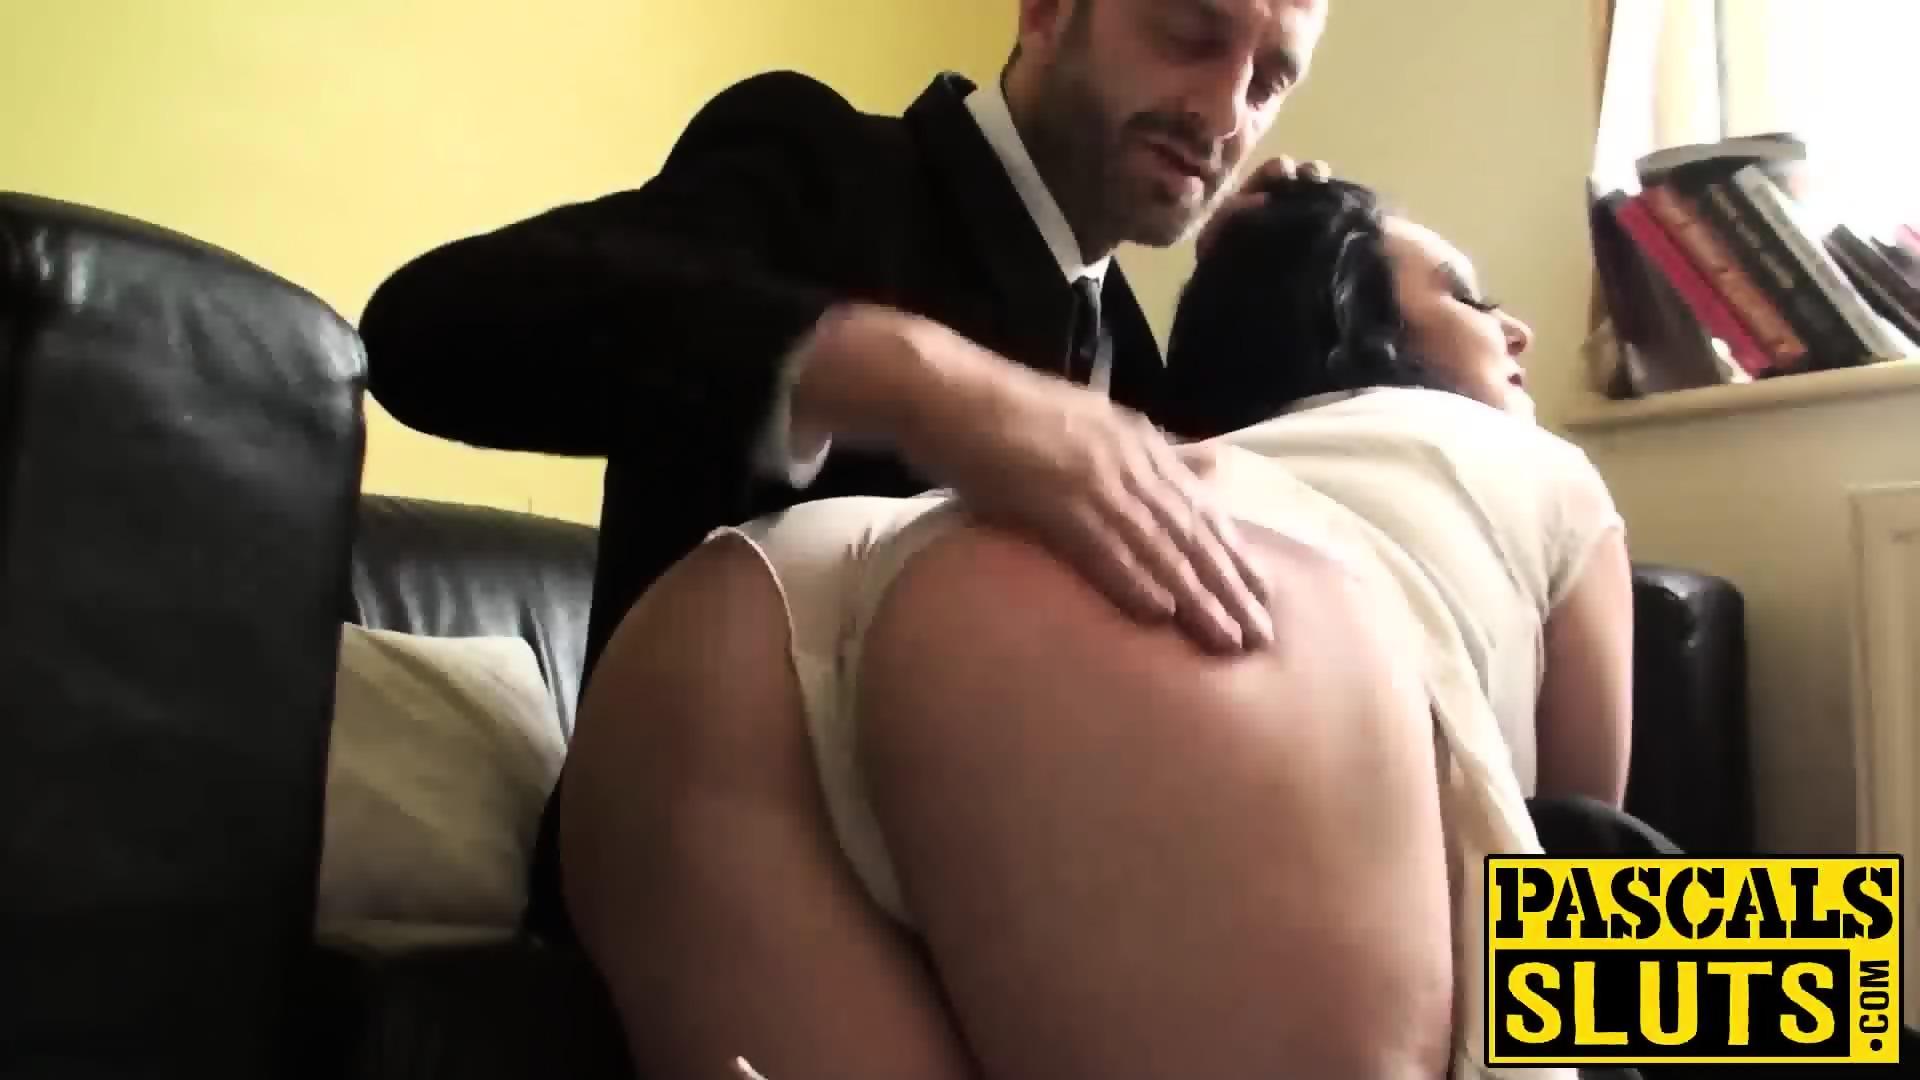 Milf slut gets fucked hard